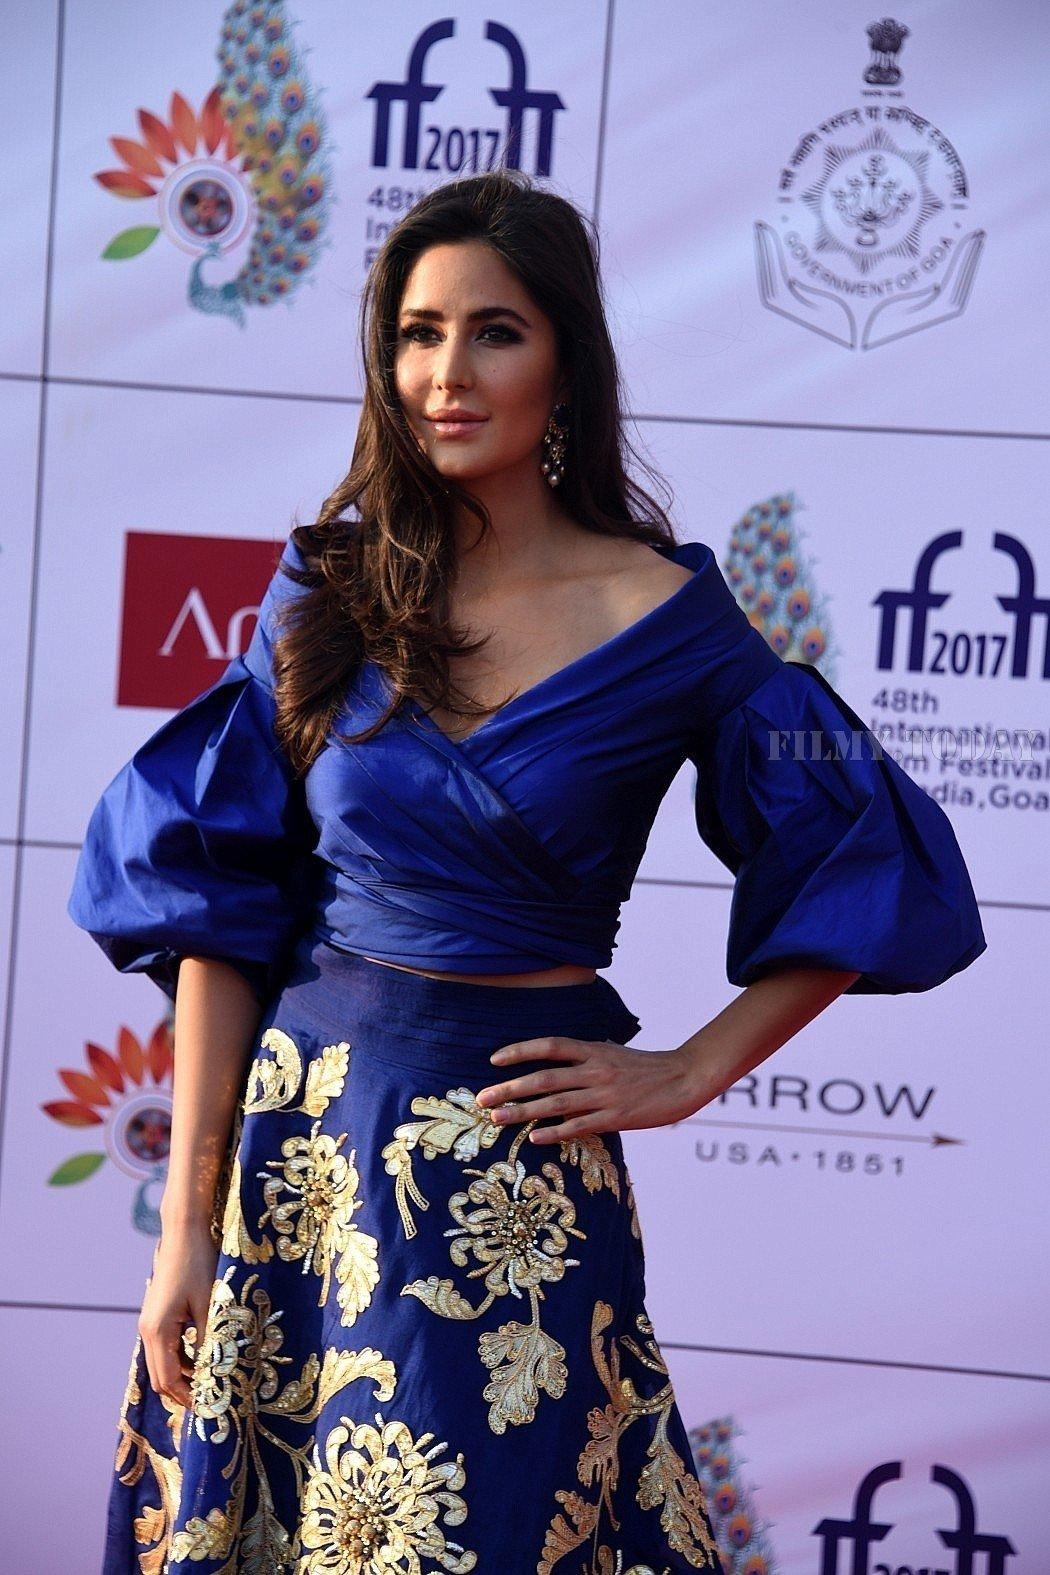 Katrina Kaif Shines in blue dress at 48th IFFI 2017 Closing Ceremony